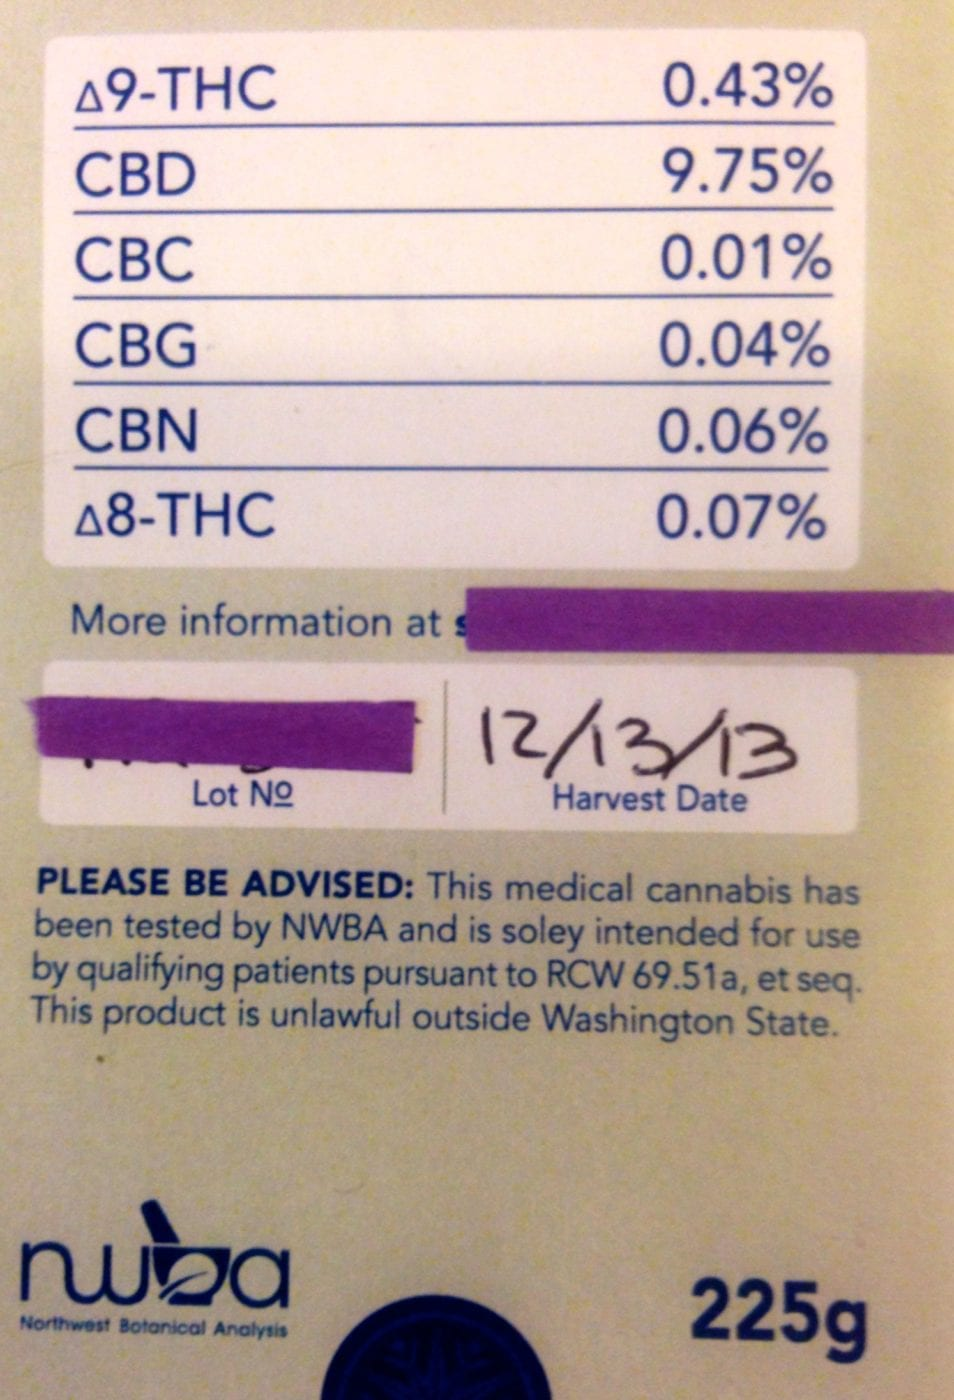 Label high in CBD